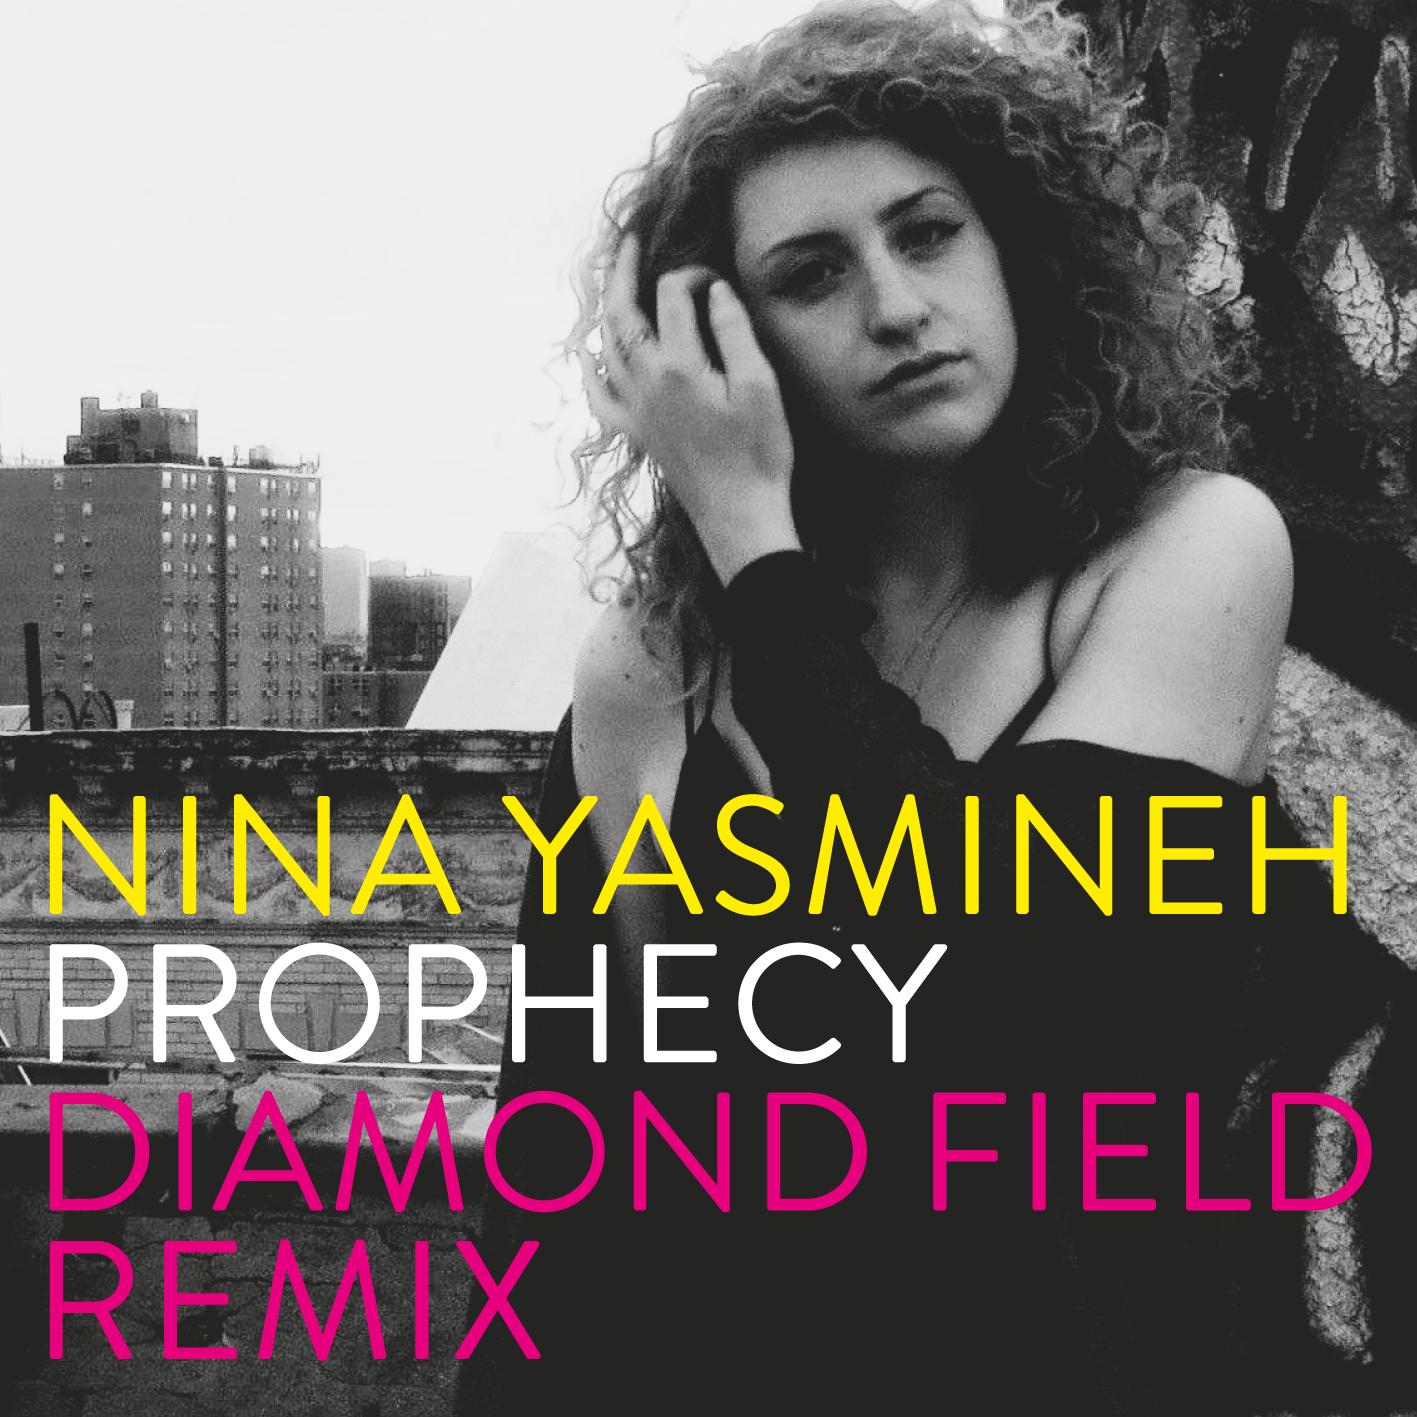 Nina Yasmineh 'Prophecy' (Diamond Field Remix)